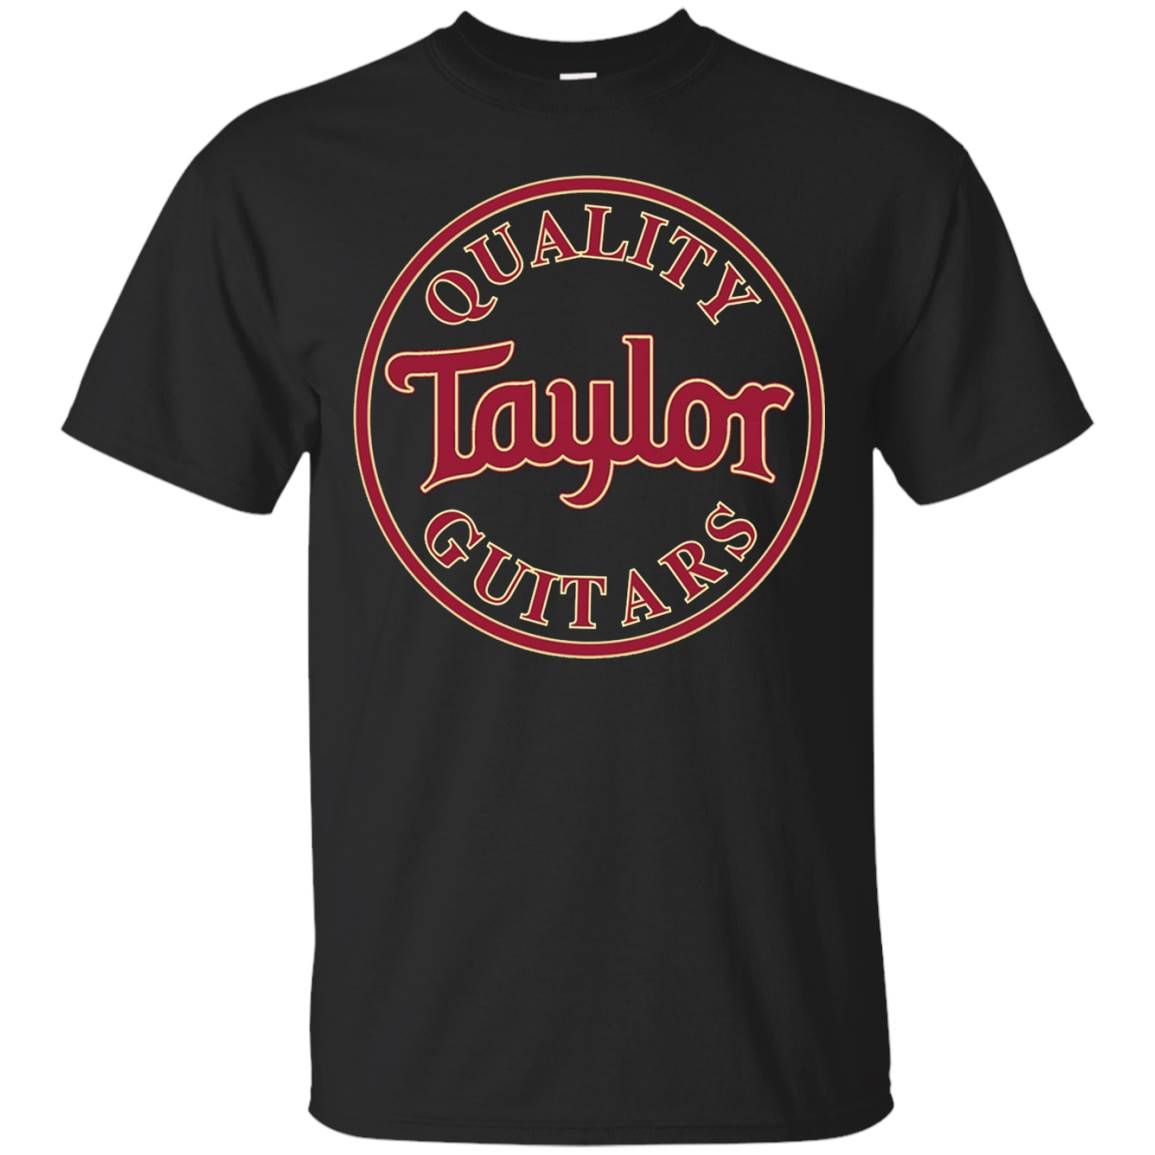 Quality Taylor Guitar